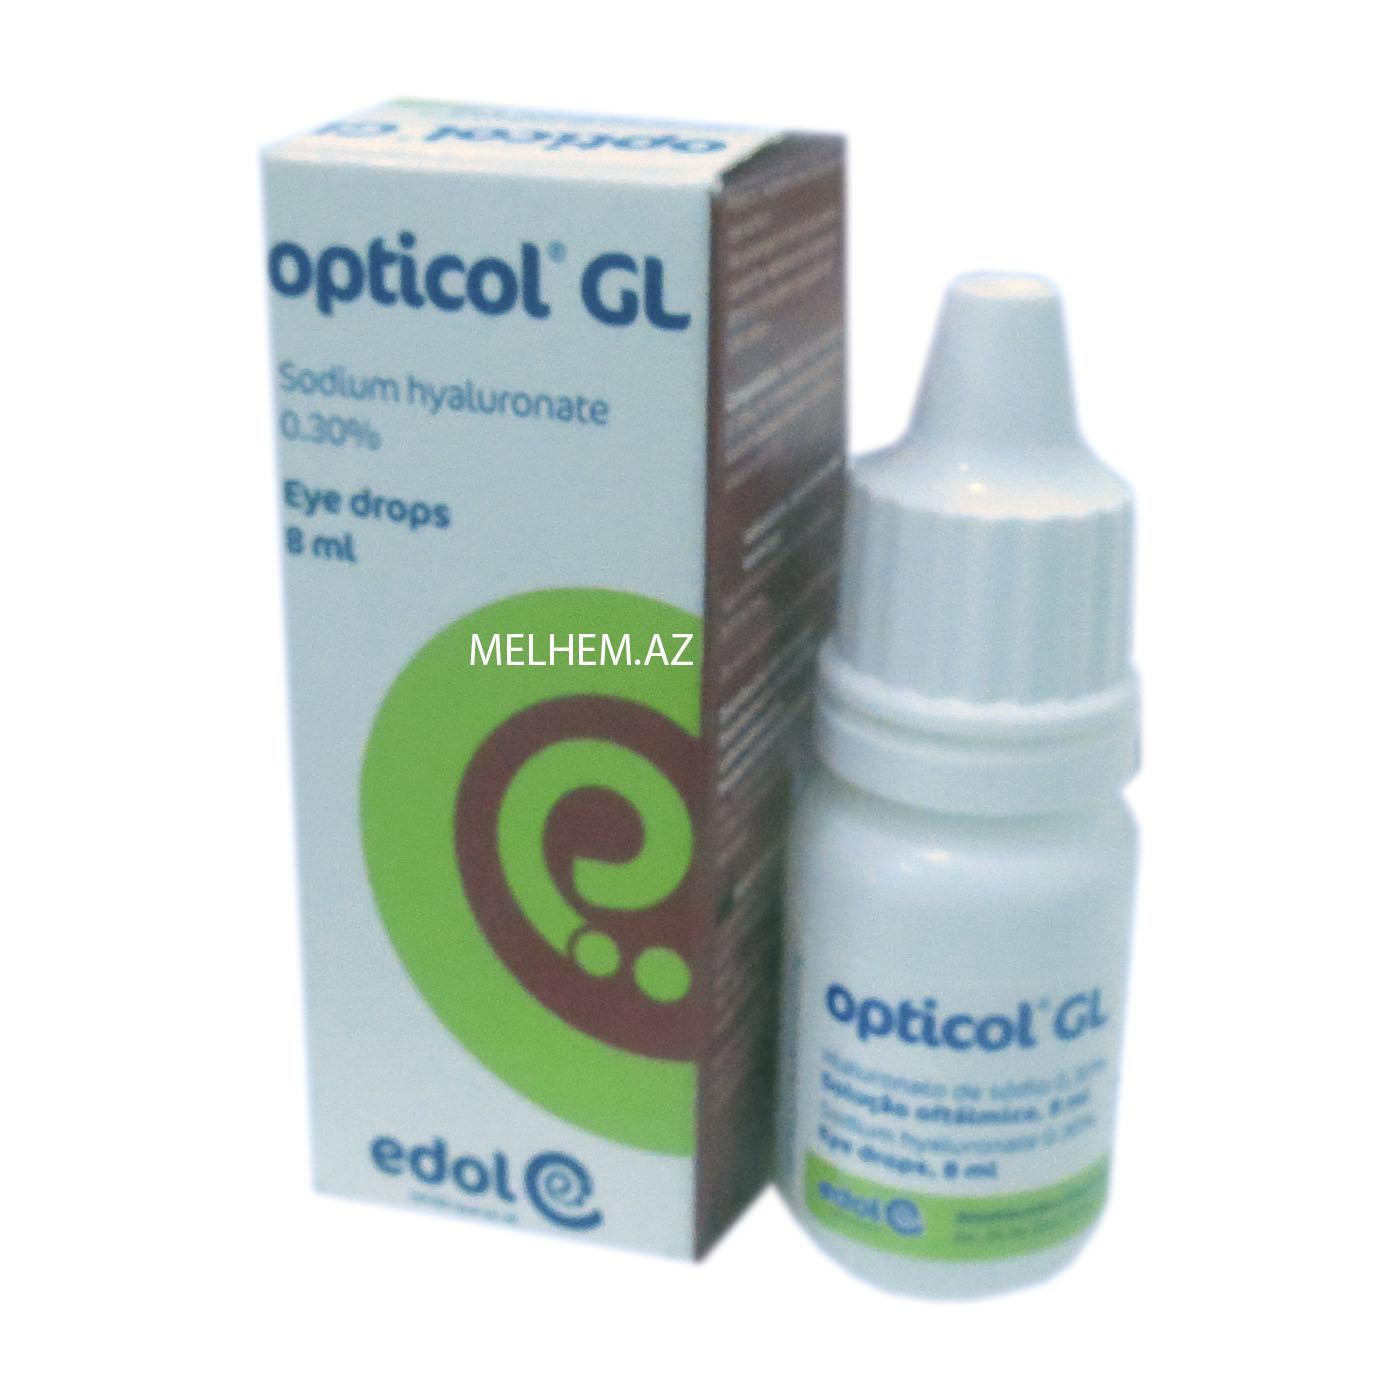 OPTICOL GL